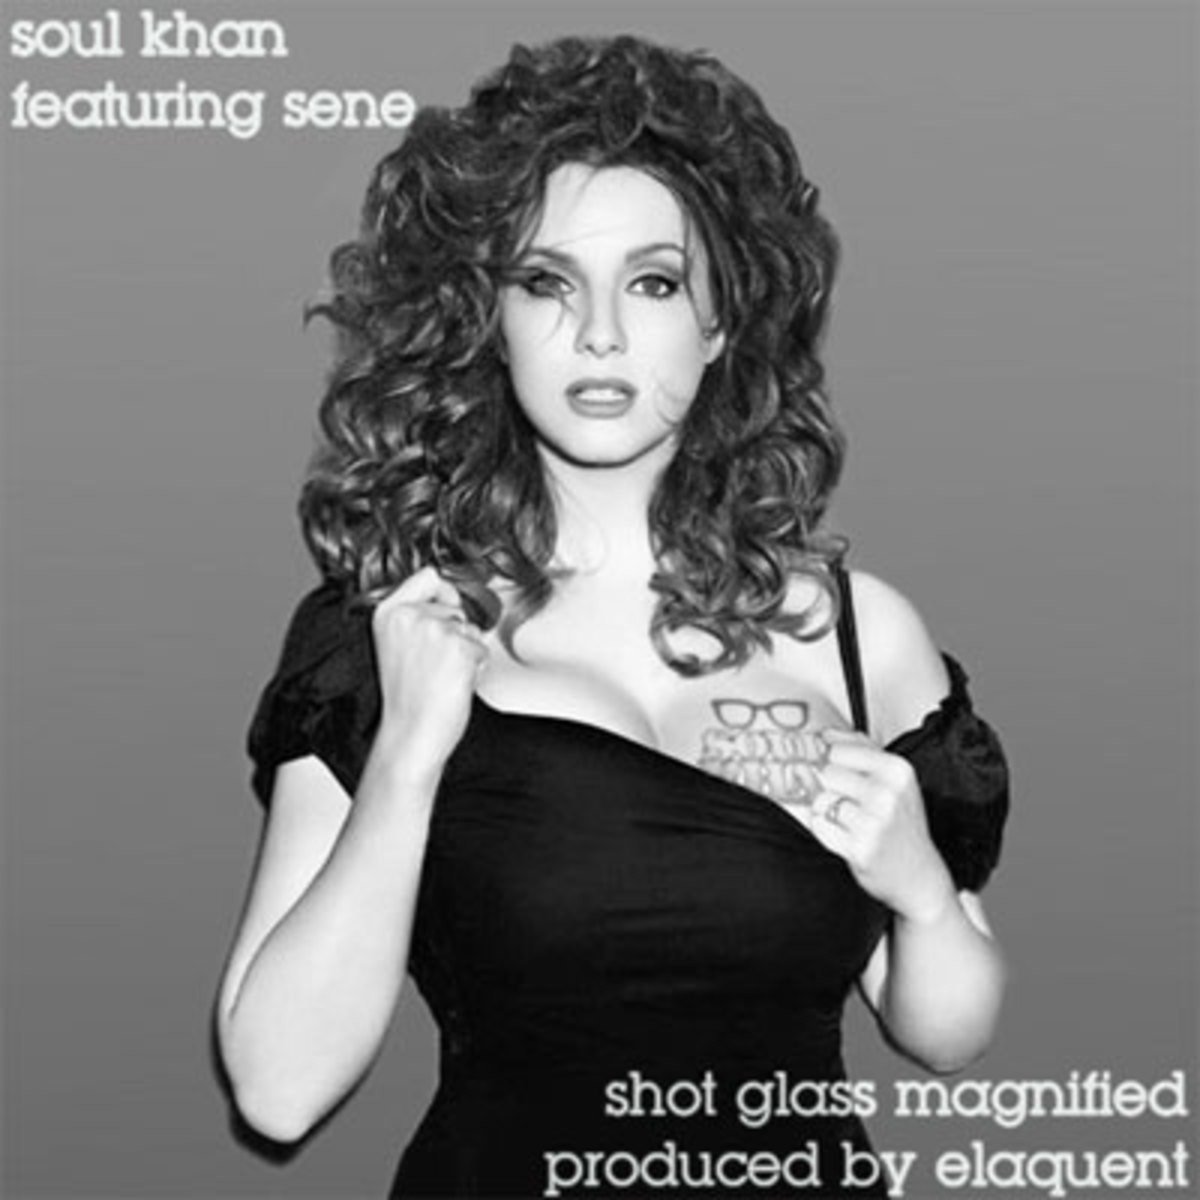 soulkhan-shotglassmagnified.jpg